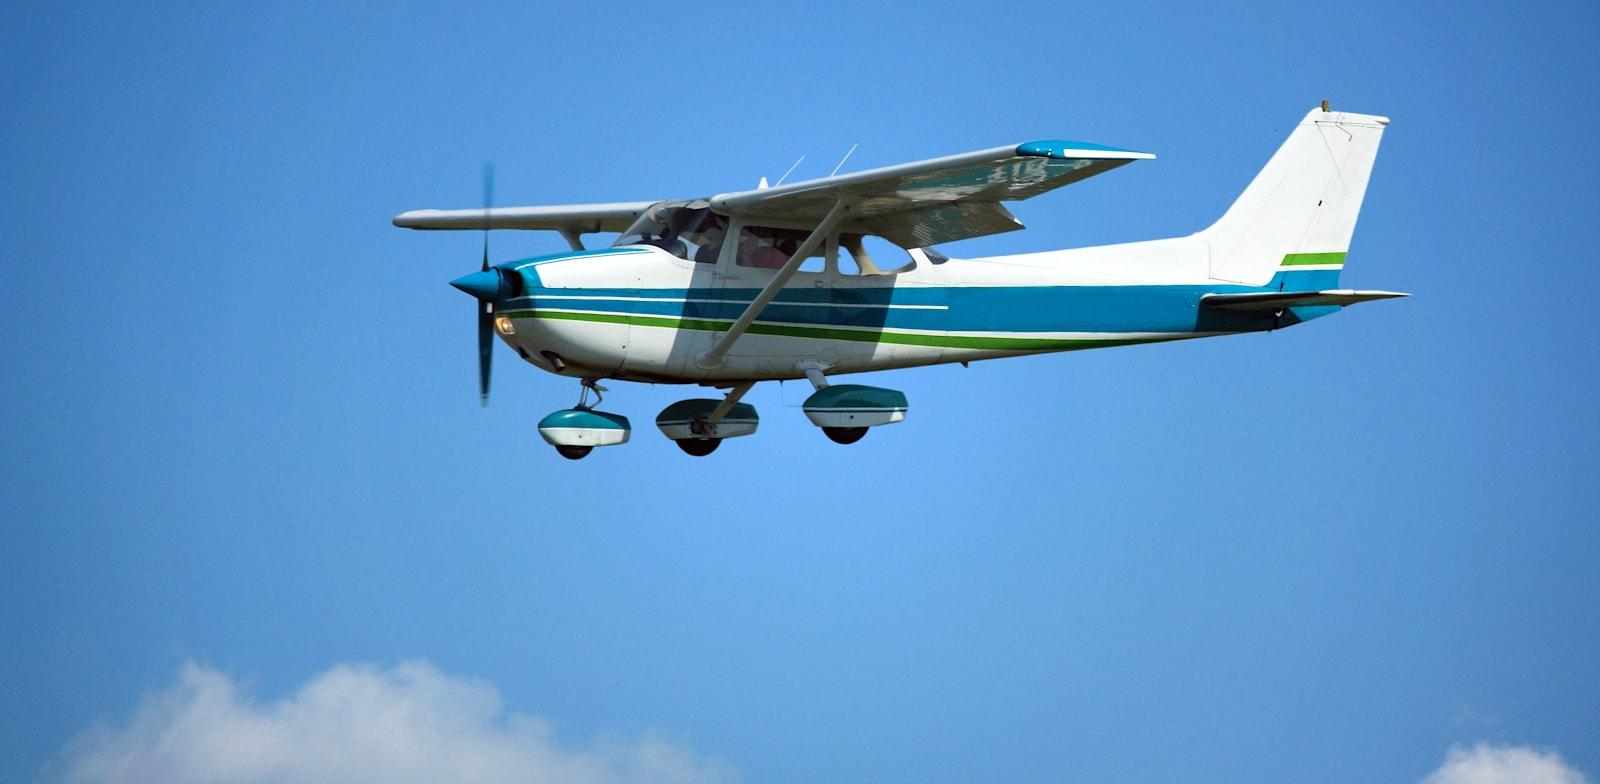 מטוס ססנה  / צילום: Shutterstock, berczy04